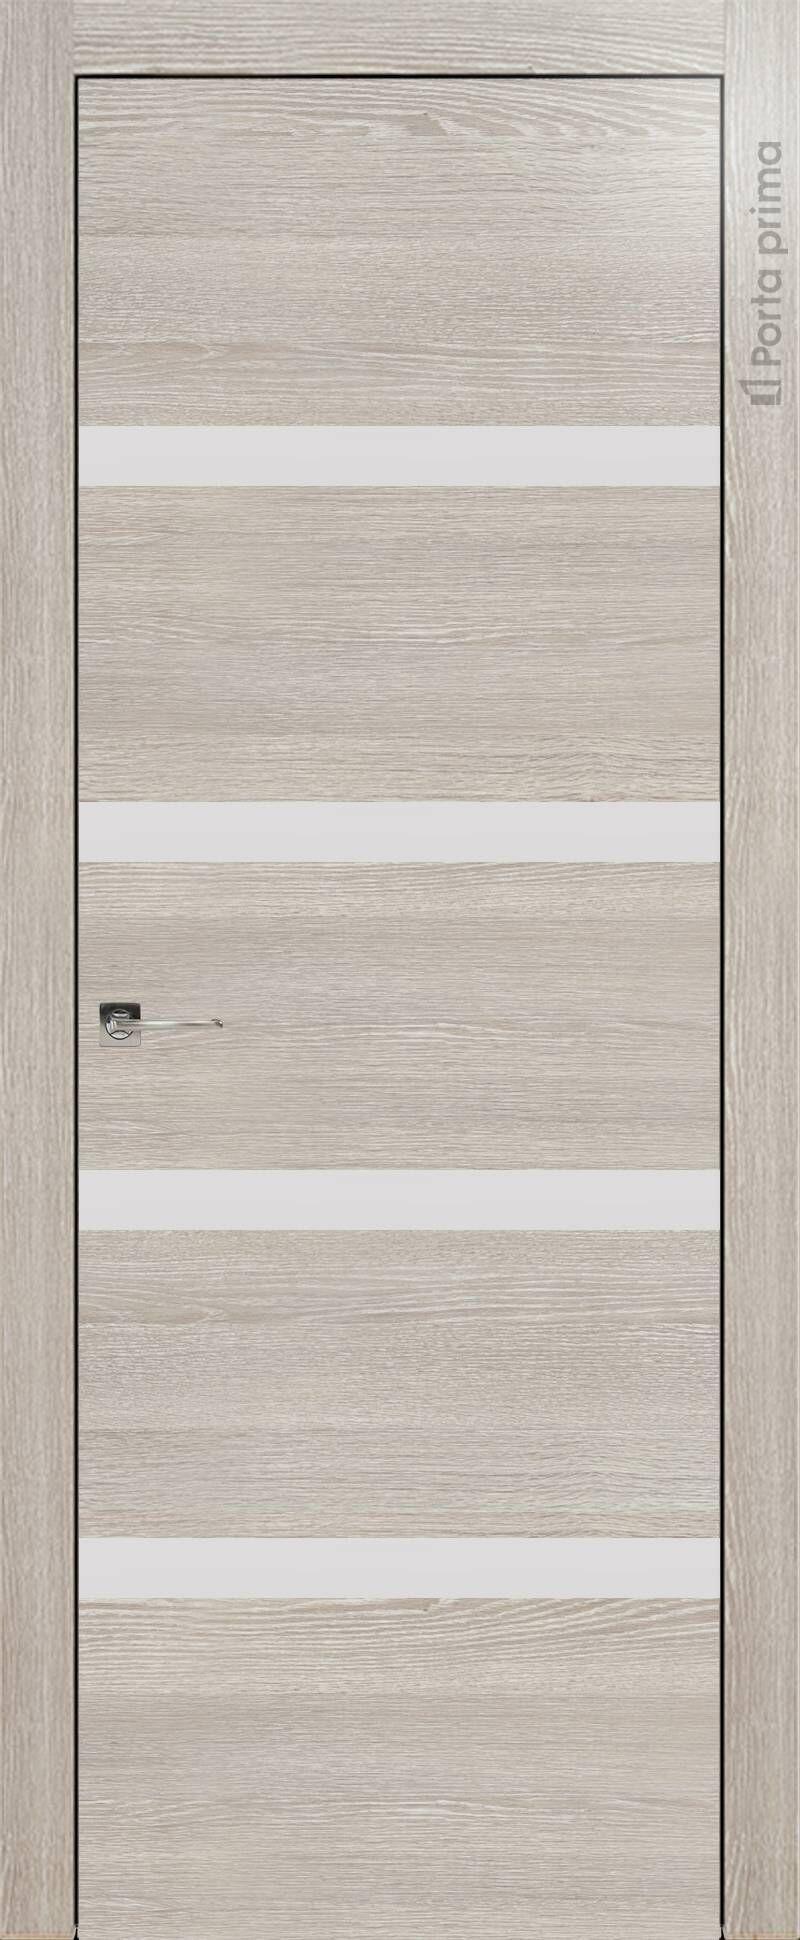 Tivoli Д-4 цвет - Серый дуб Без стекла (ДГ)